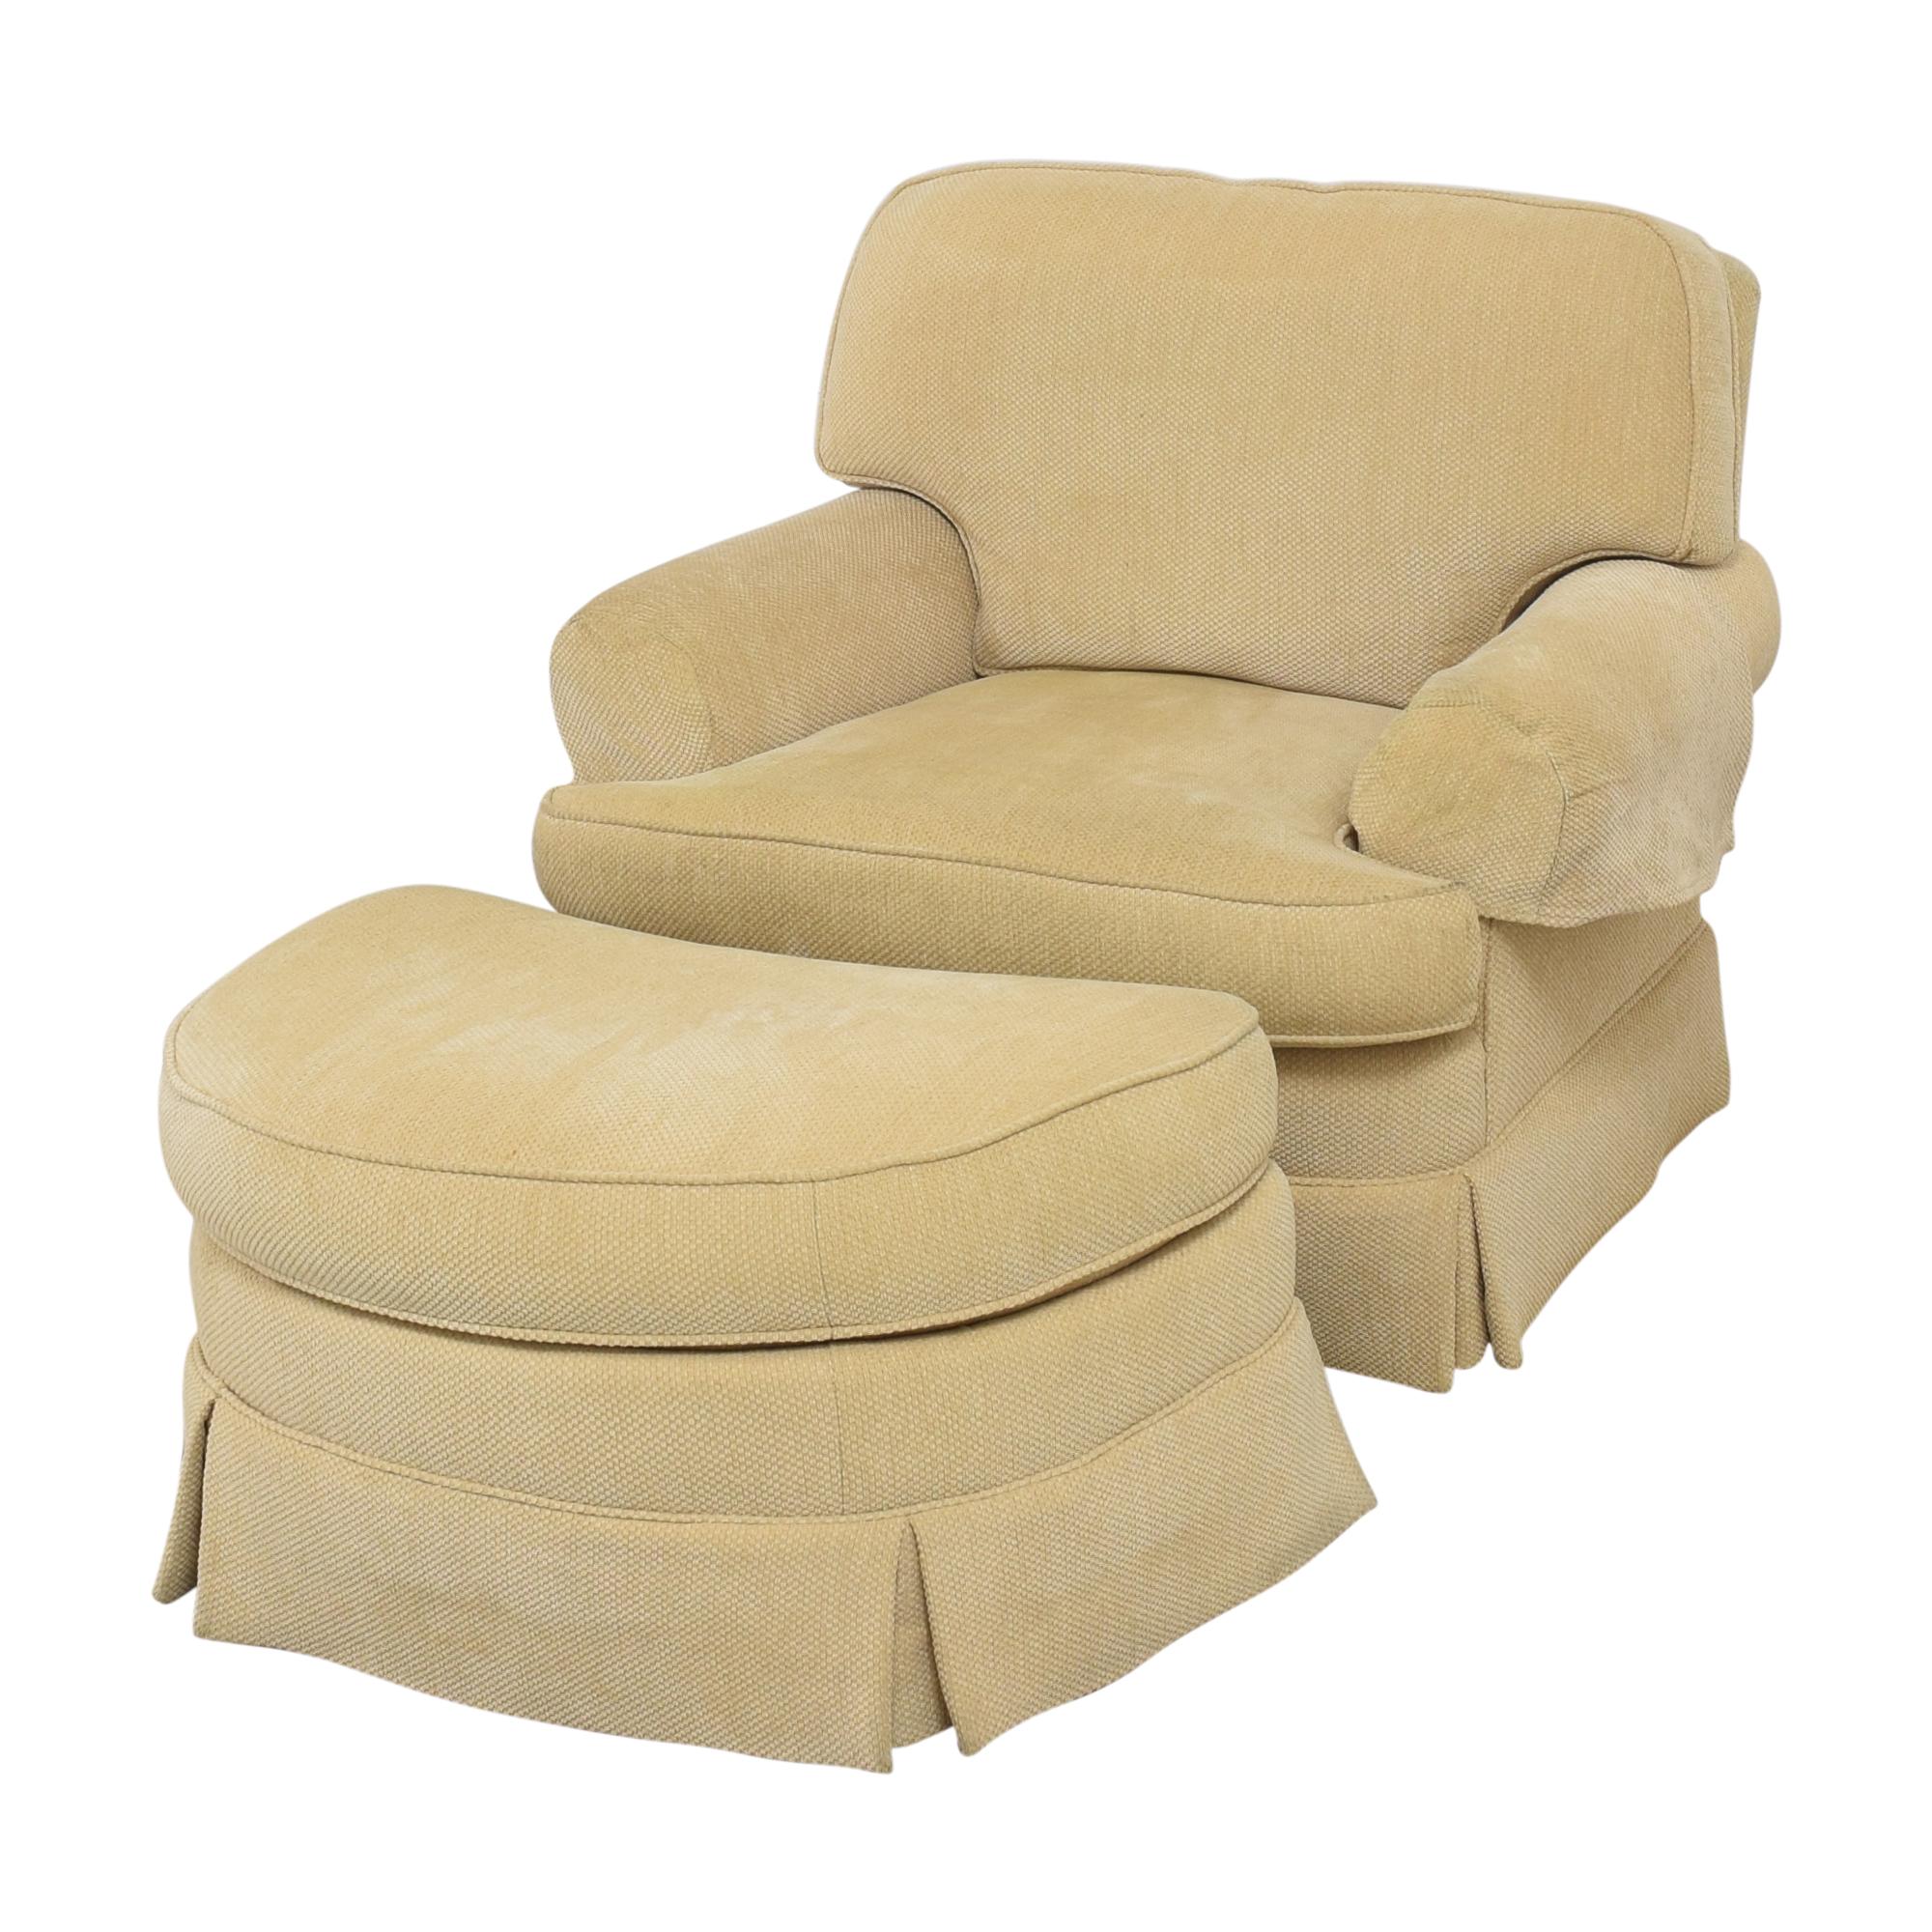 Ralph Lauren Home Ralph Lauren Home Chair with Ottoman on sale